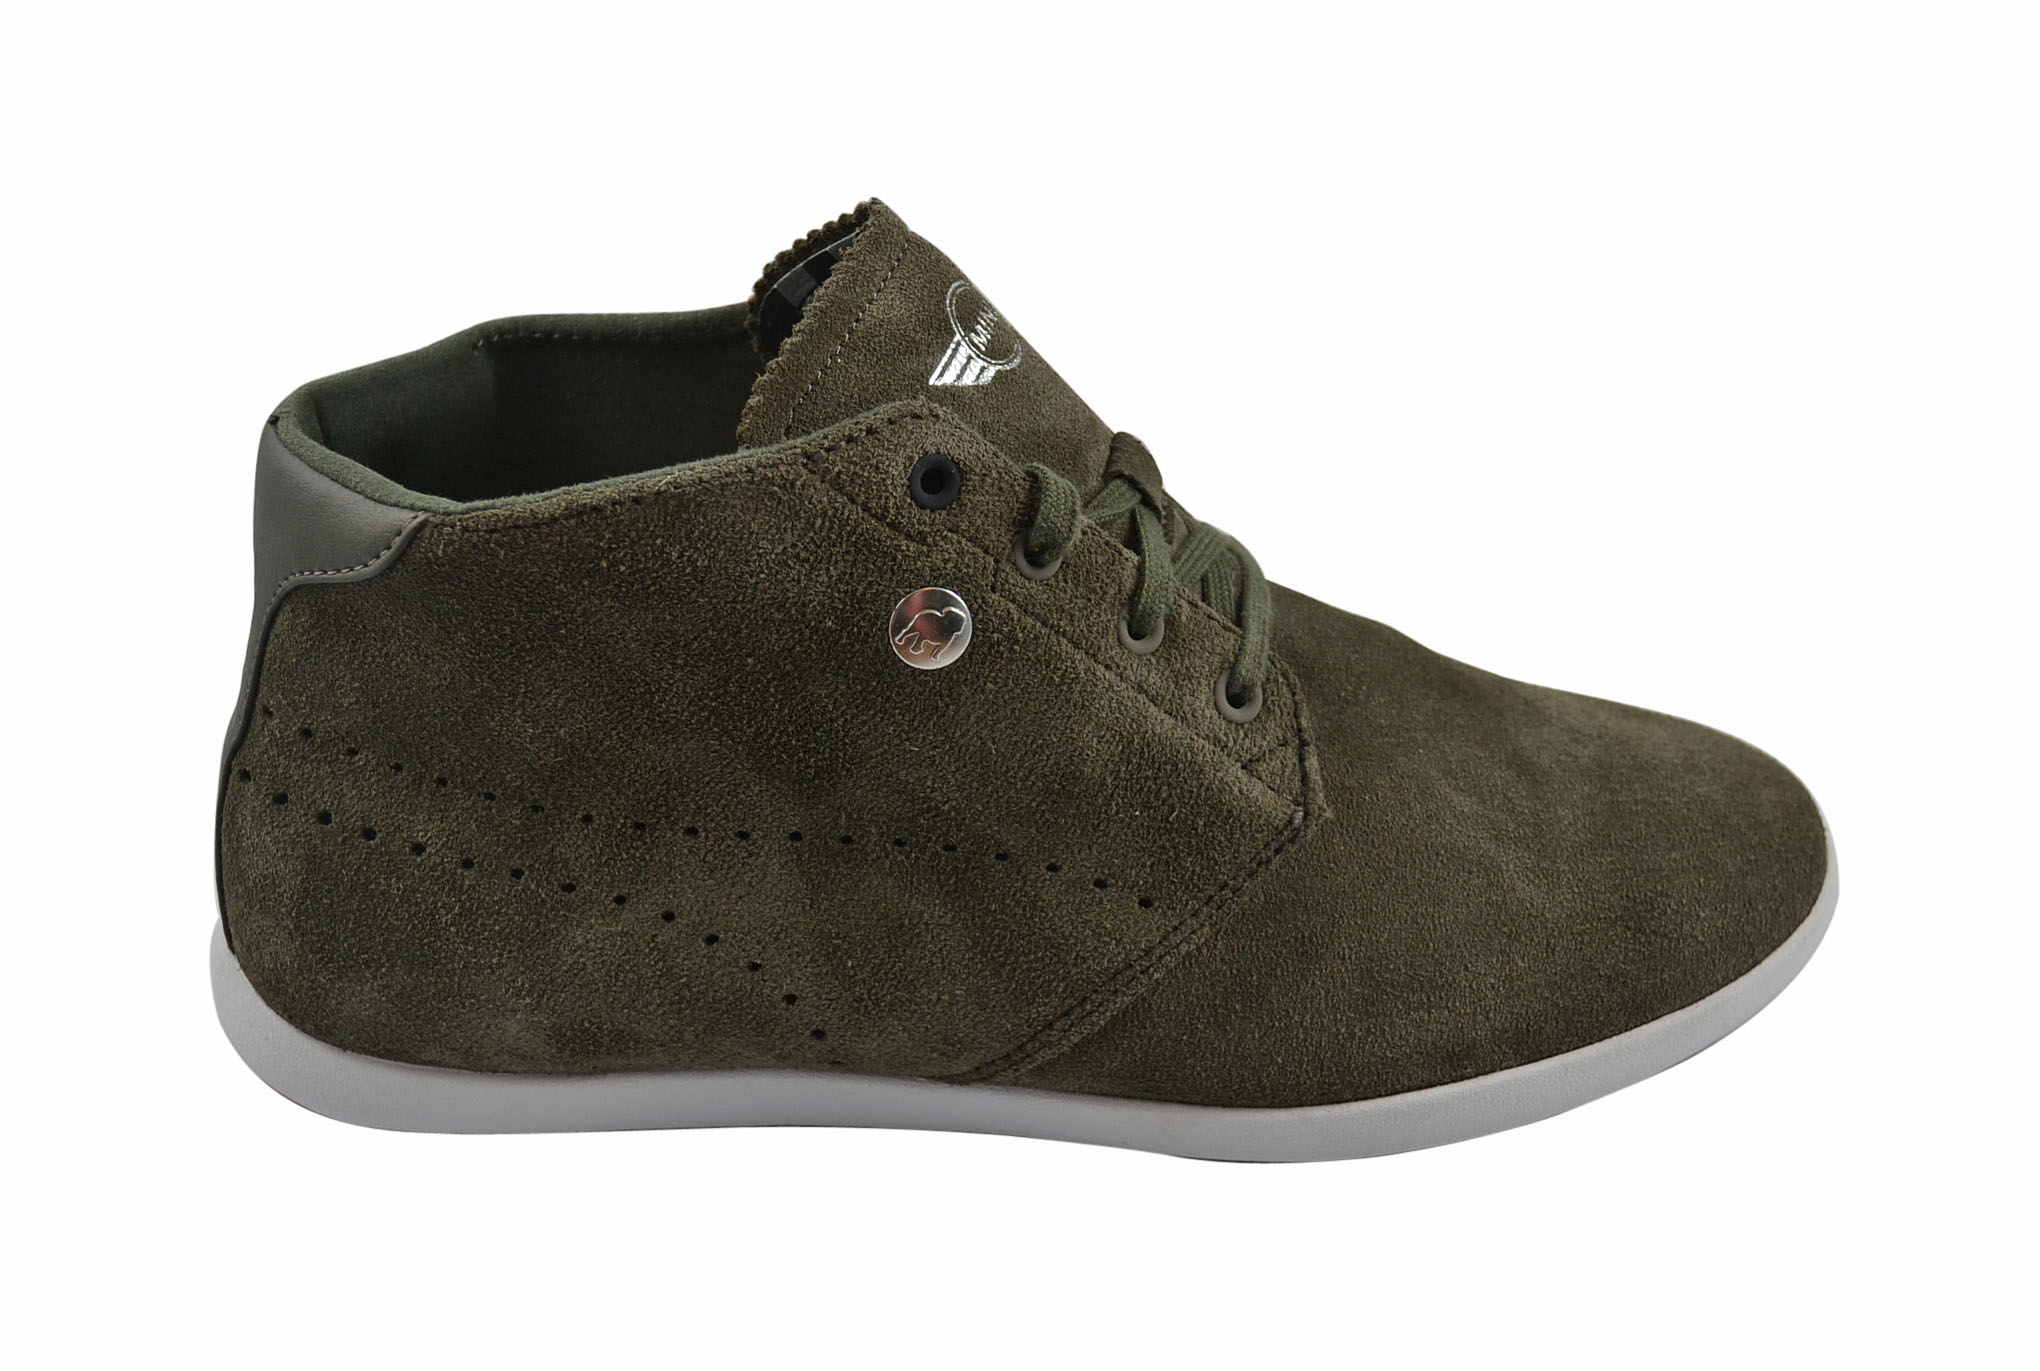 Details about Puma Alwyn Mid Mini Edition grape leafblack SneakerSchuhe olive 304379 03